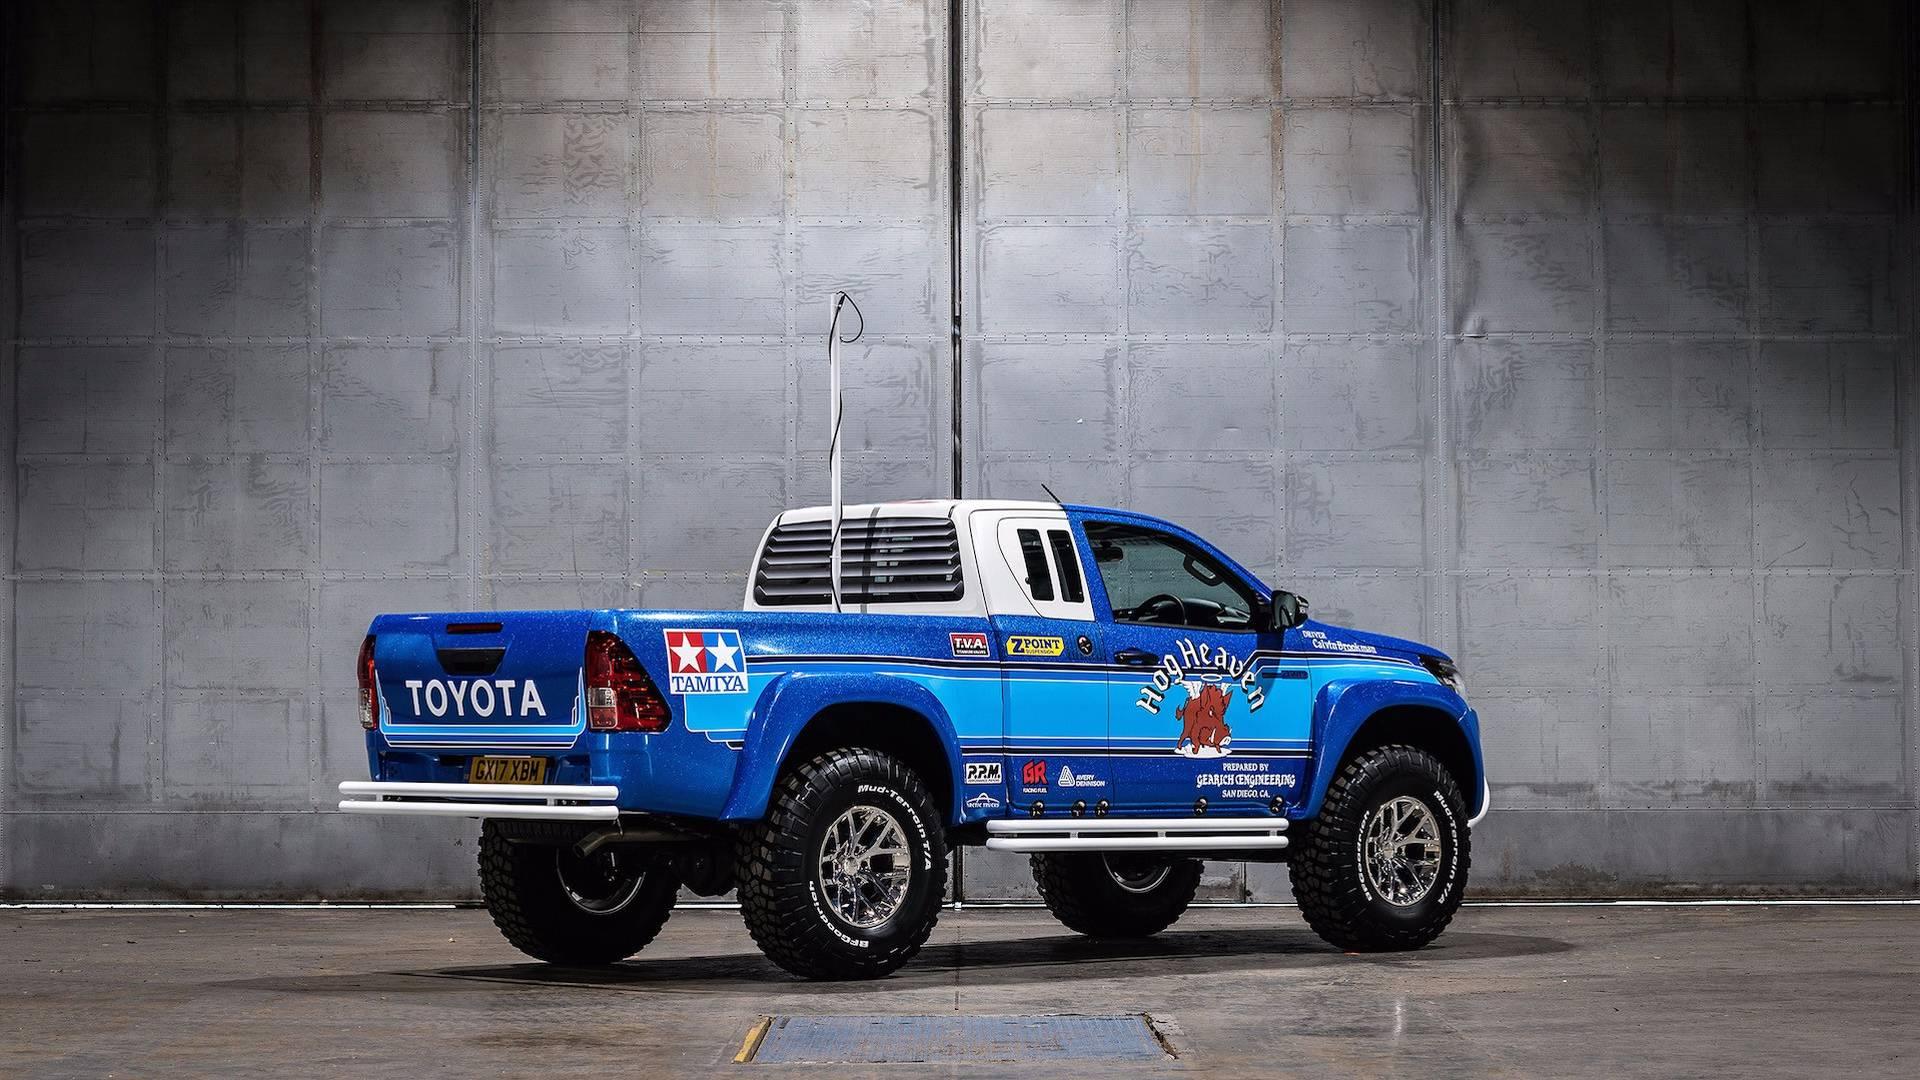 Toyota_Hilux_Bruiser_04